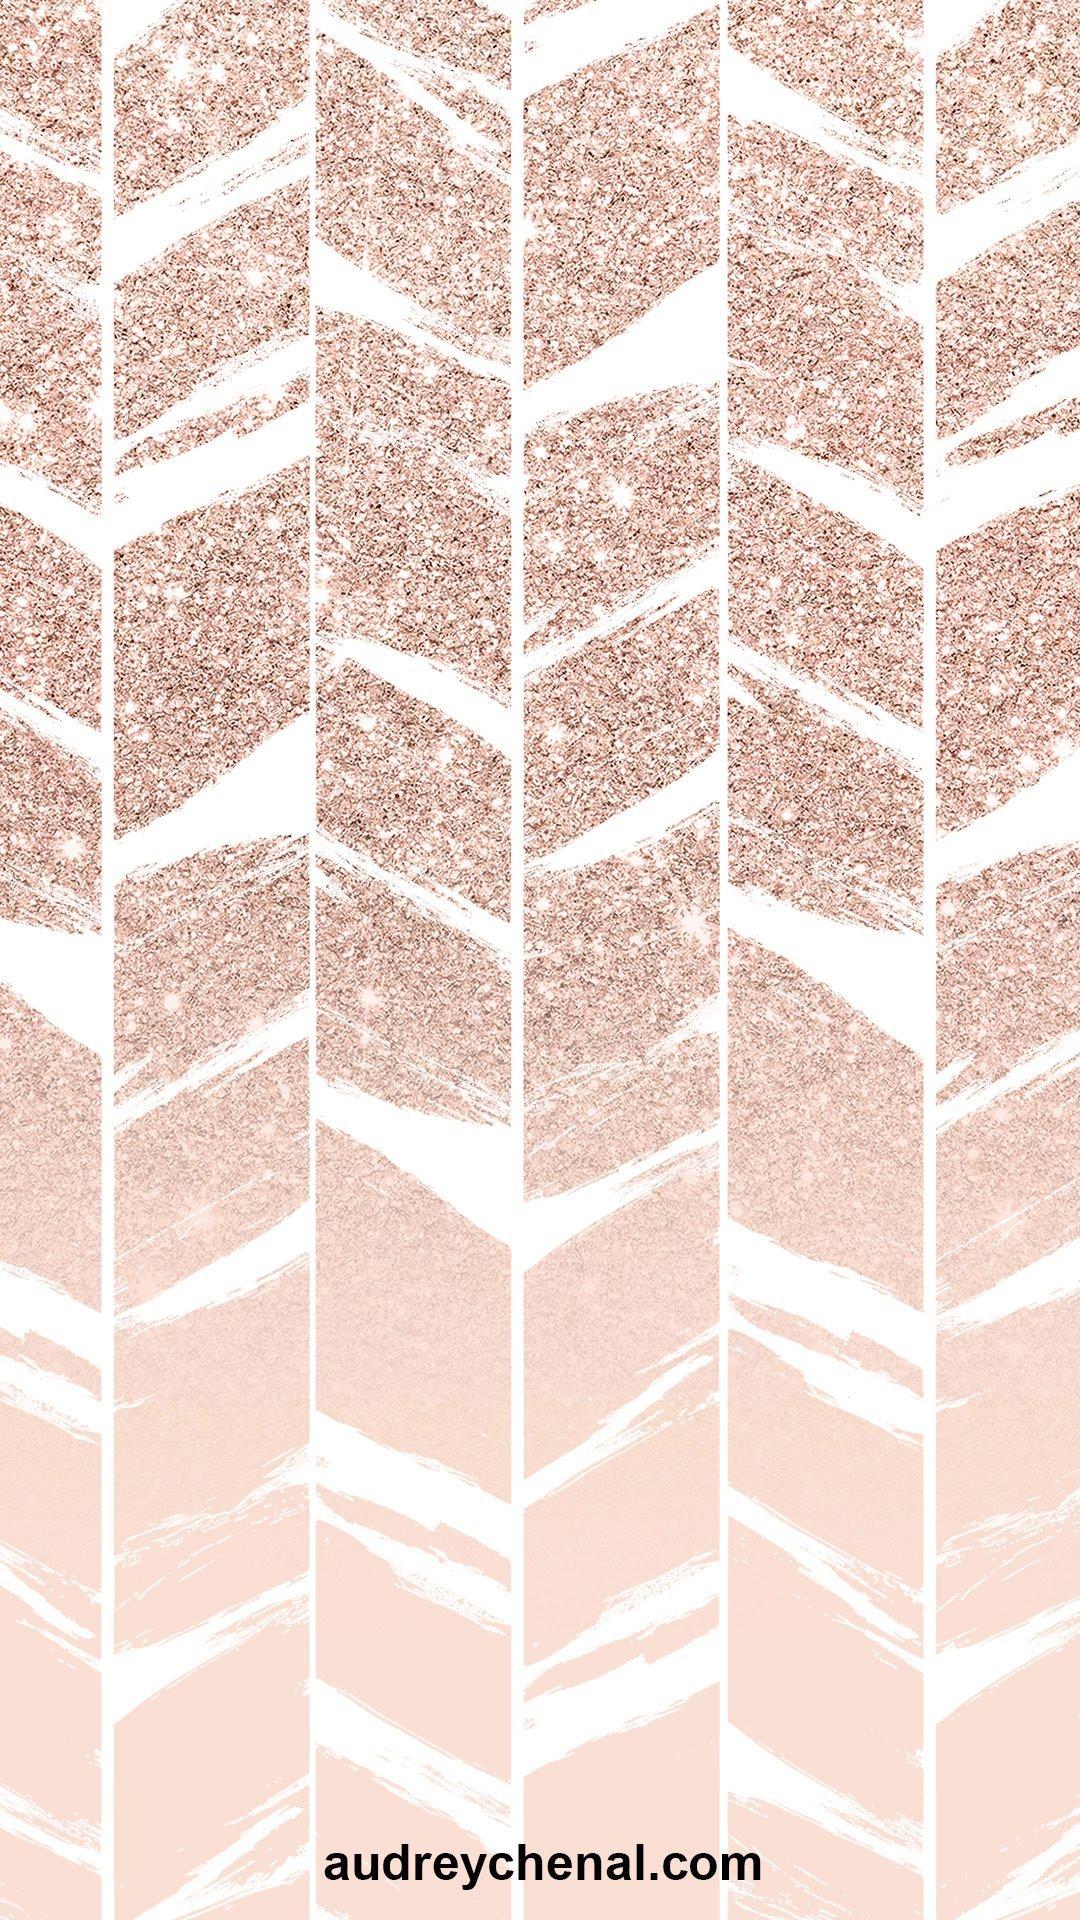 wallpaper pink glitter blush pastel pink ombre chevron herringbone pattern by Audrey Chenal